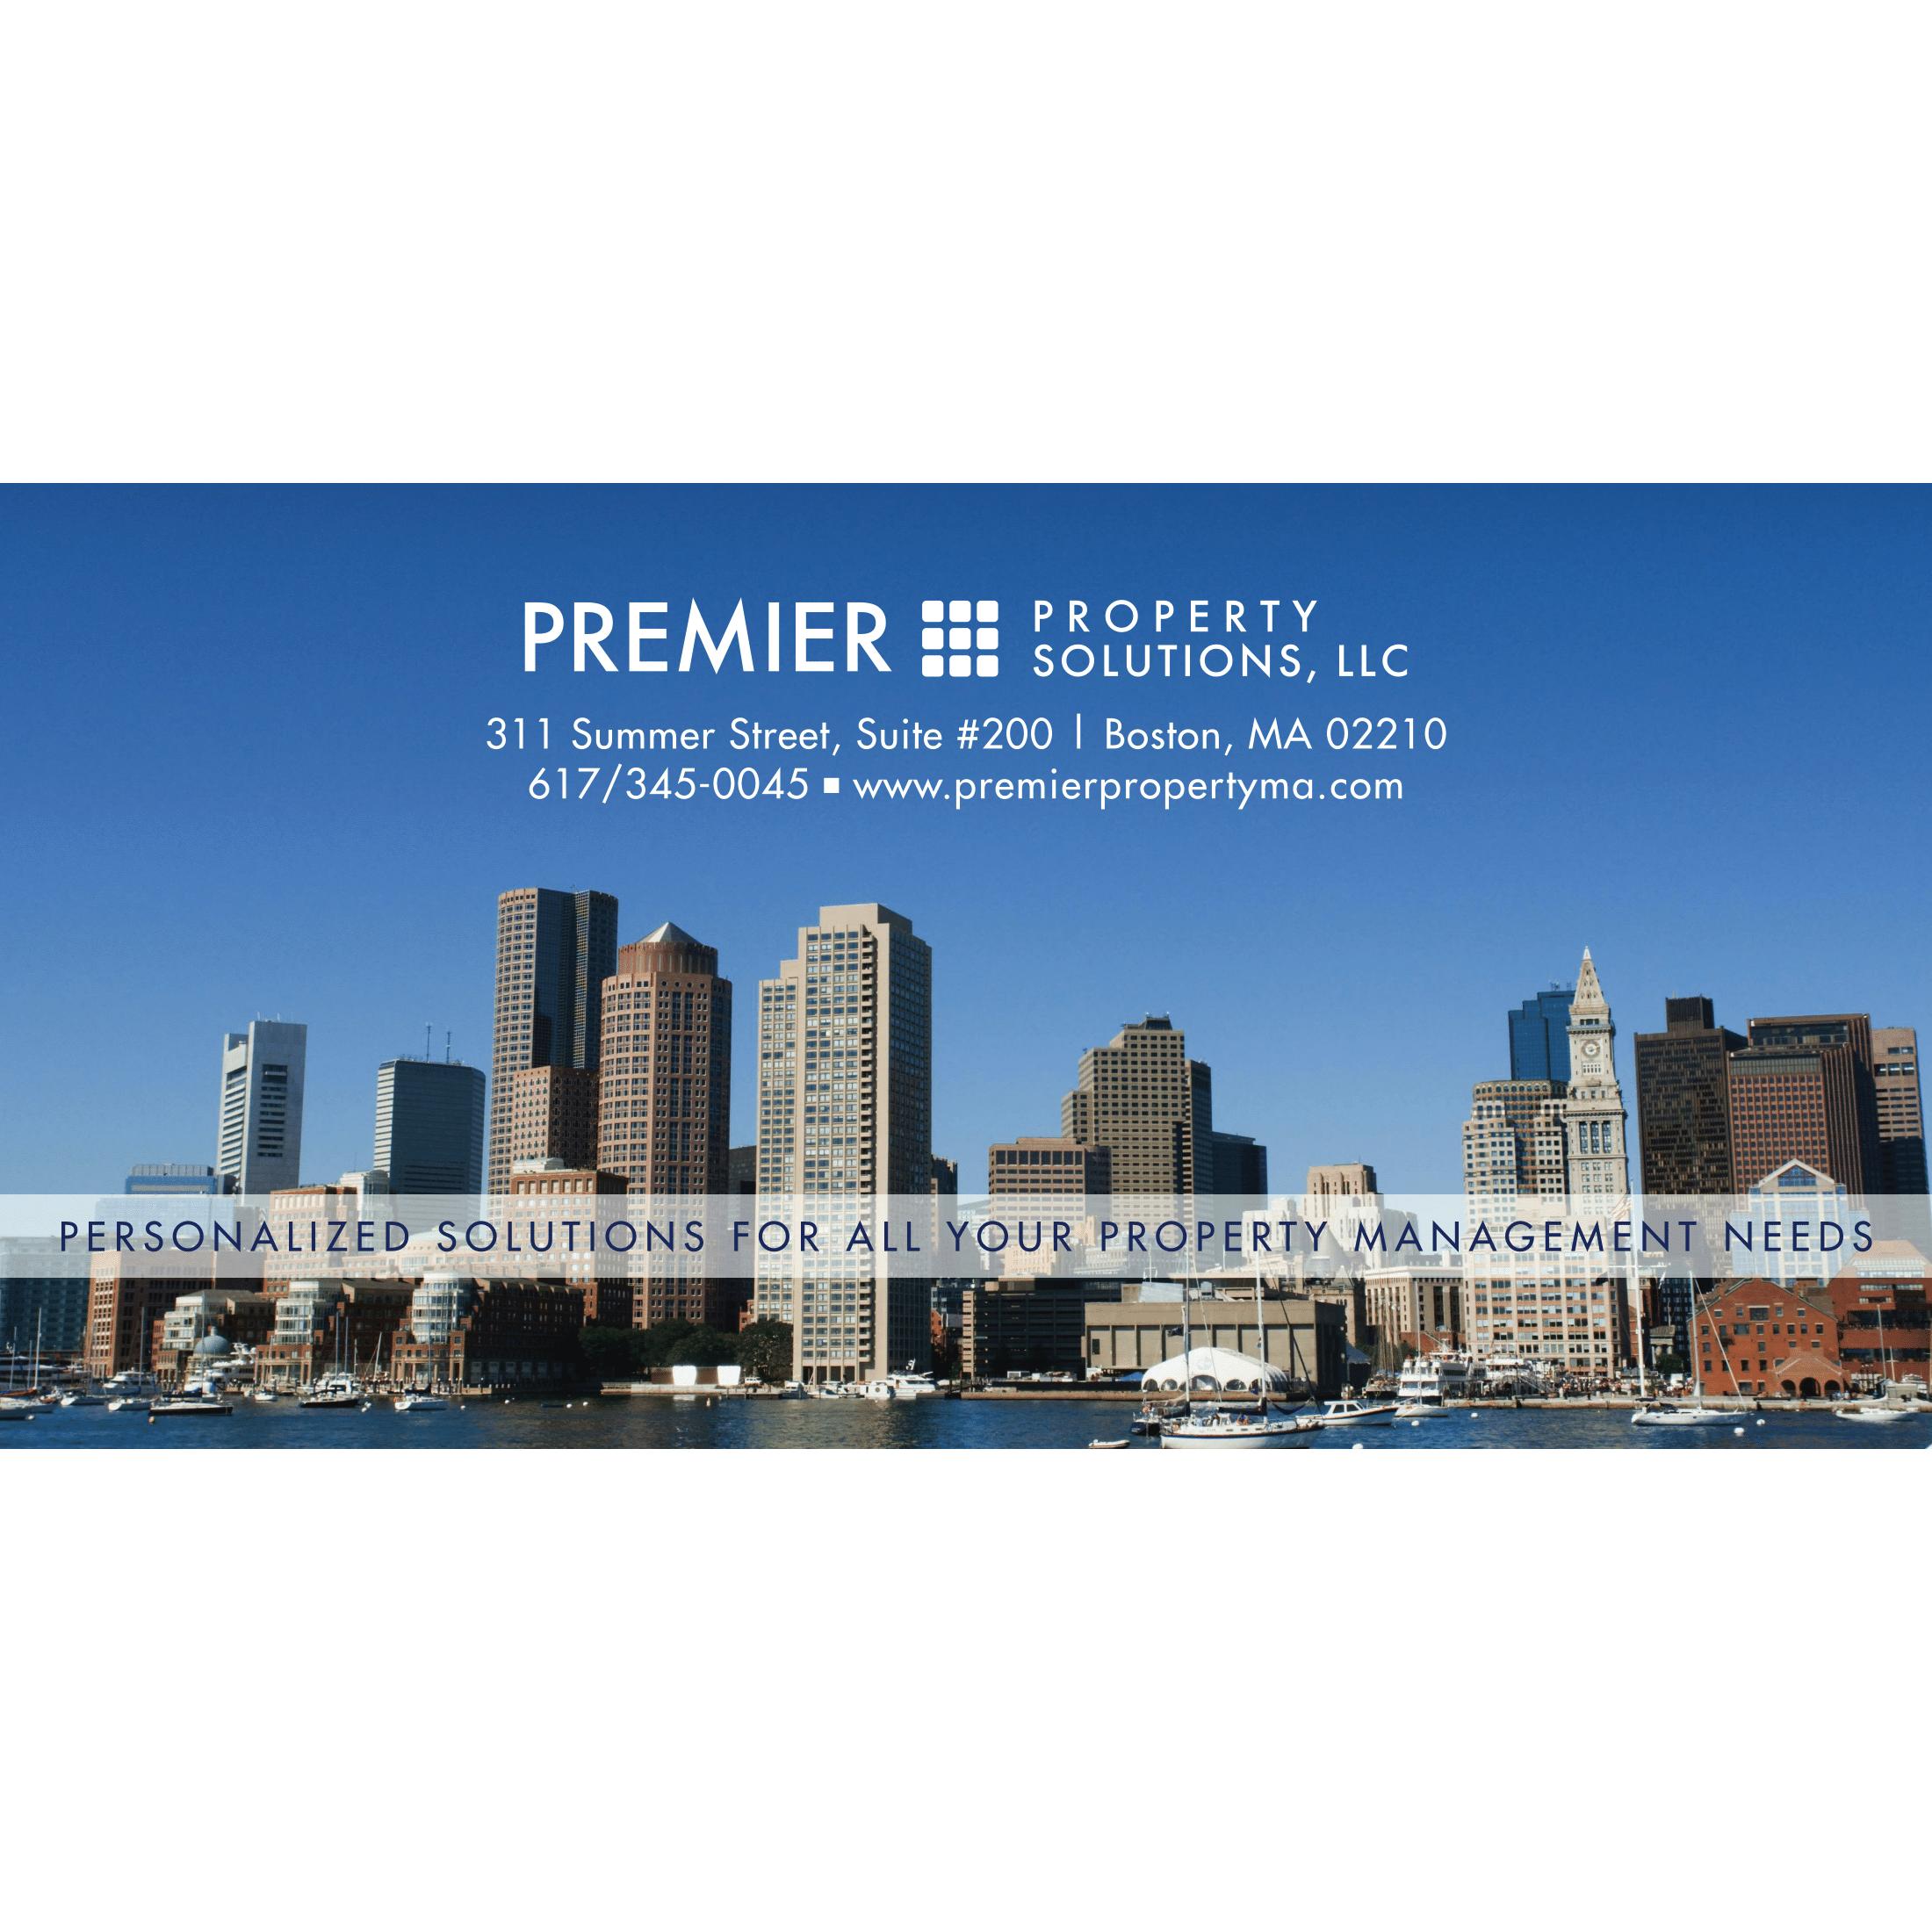 Premier Property Solutions, LLC